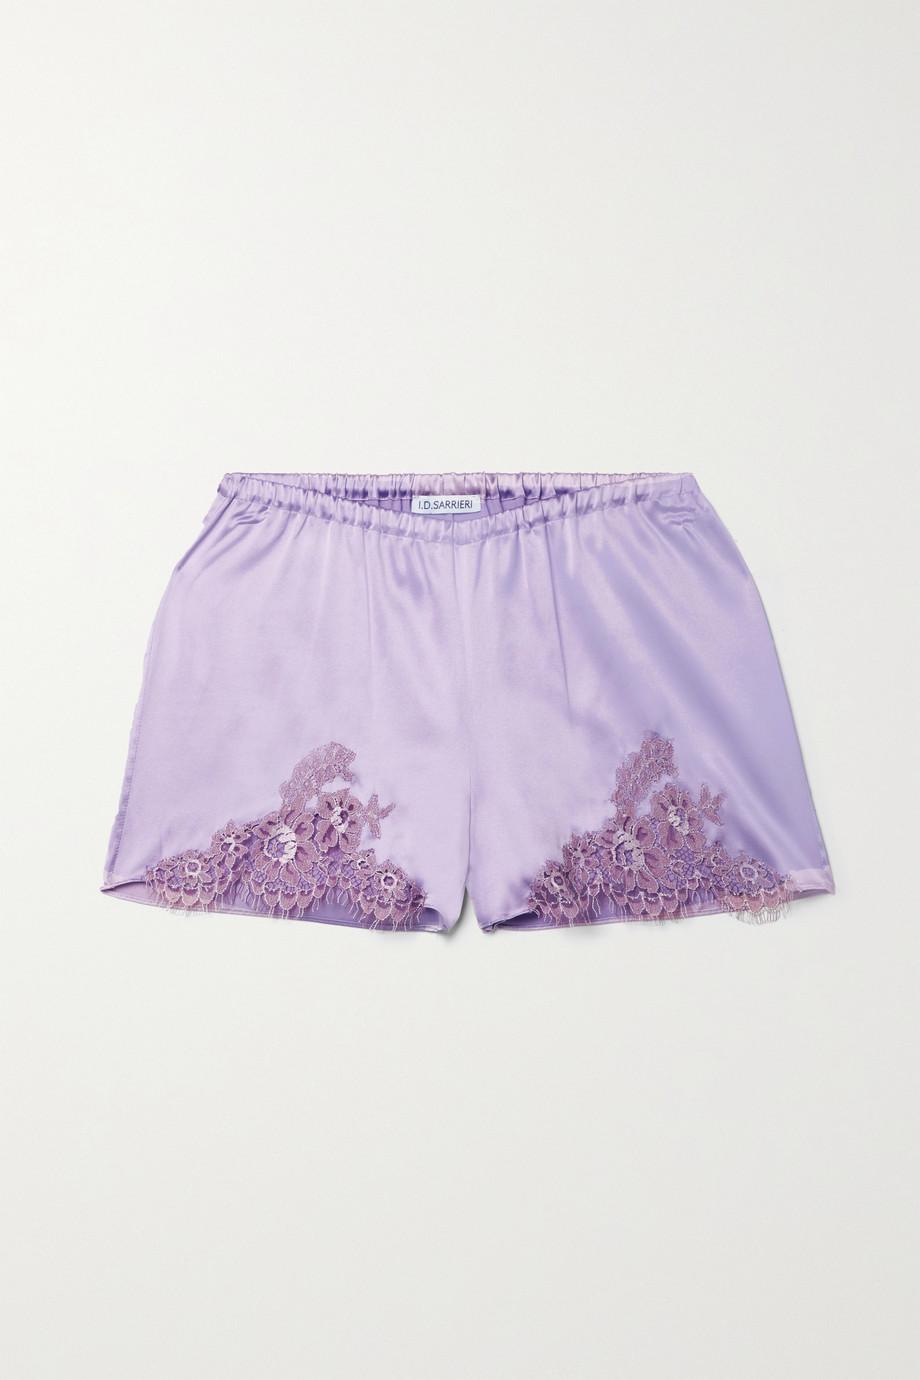 I.D. Sarrieri Hôtel Particulier Chantilly lace-trimmed silk-blend satin pajama shorts